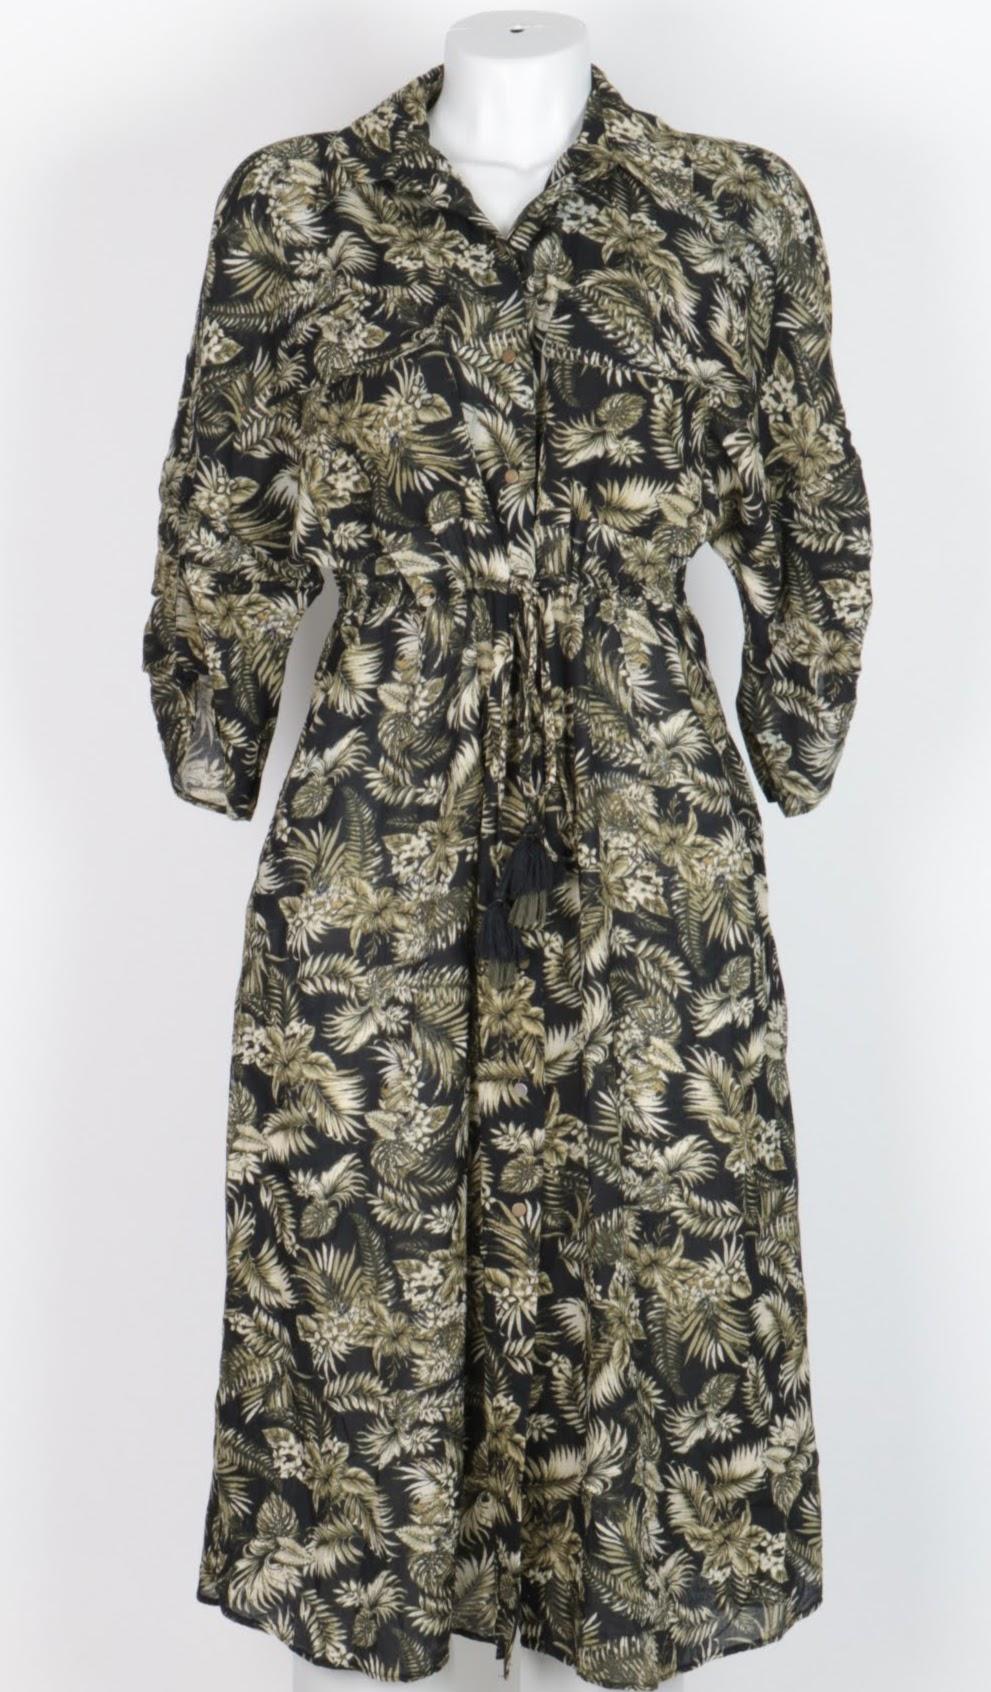 Vestido Longo - Zara - PP